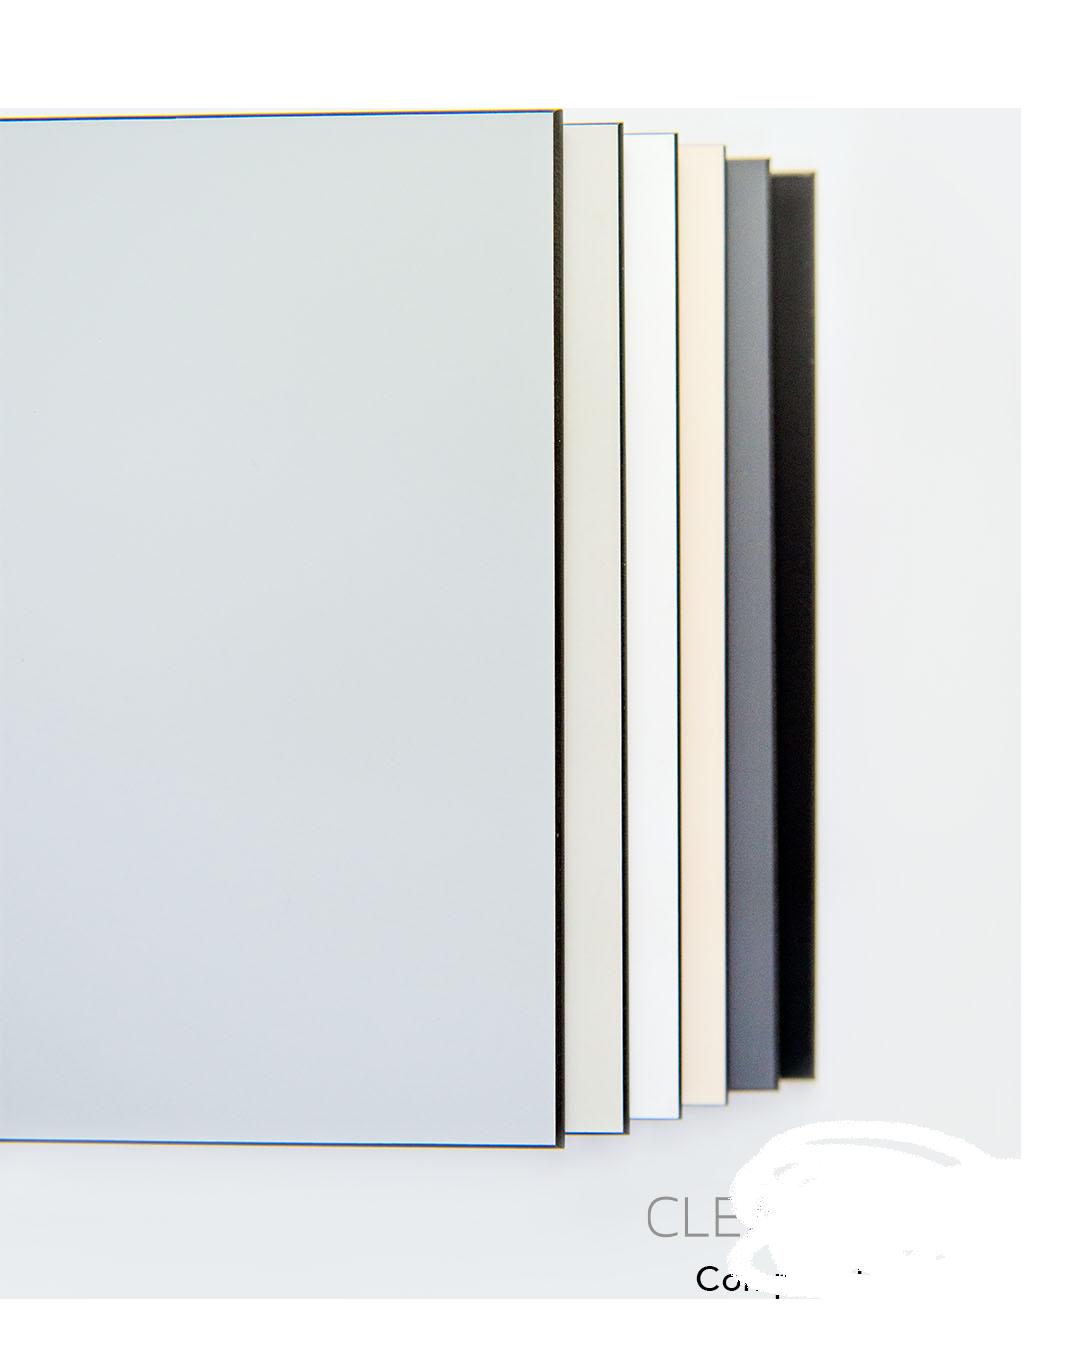 Melatone – Clean Touch Compact Laminates